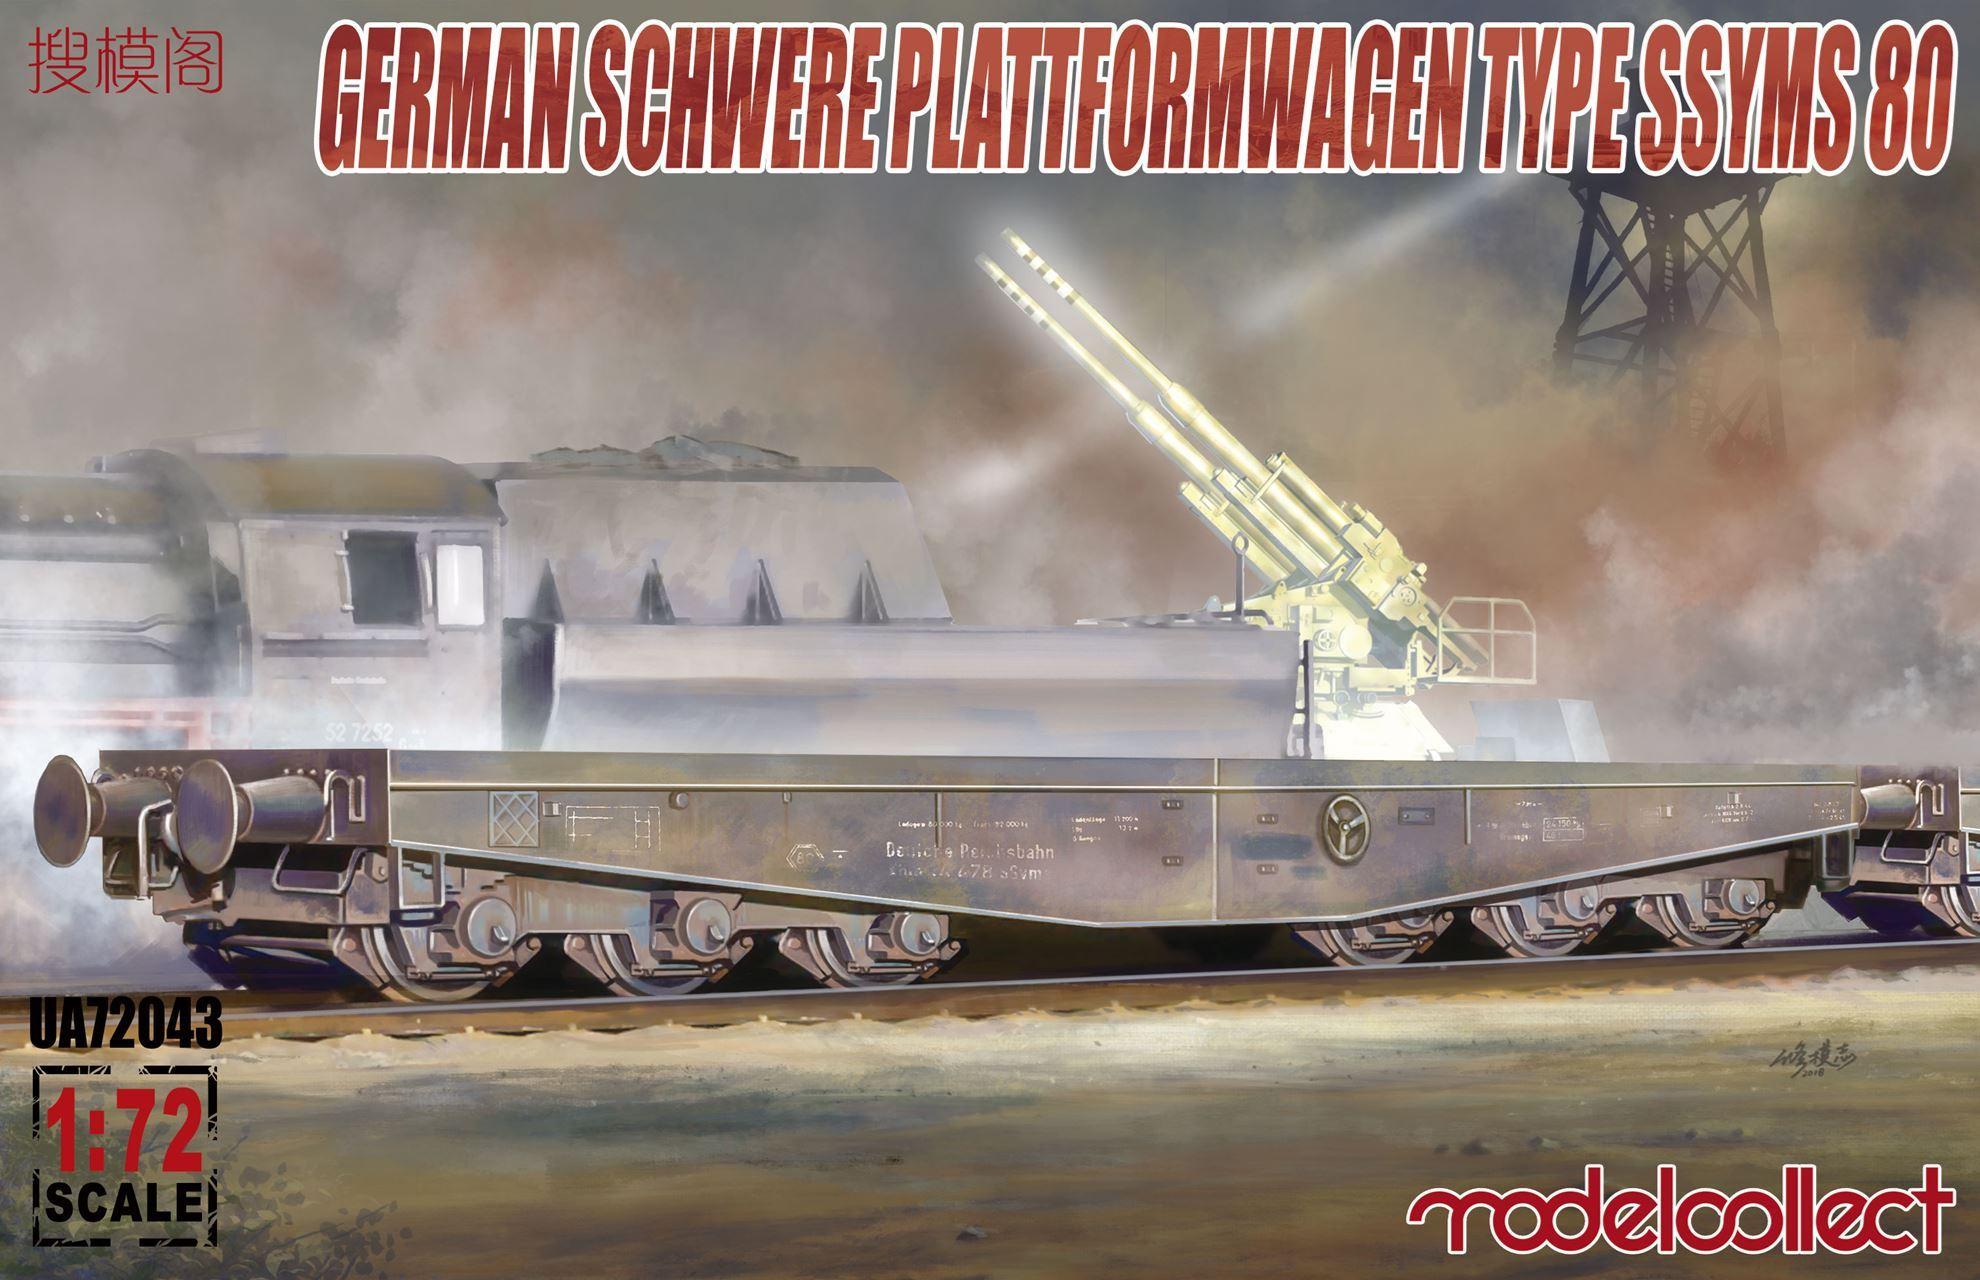 ModelCollect Germany Schwerer plattformwagen type ssyms 80